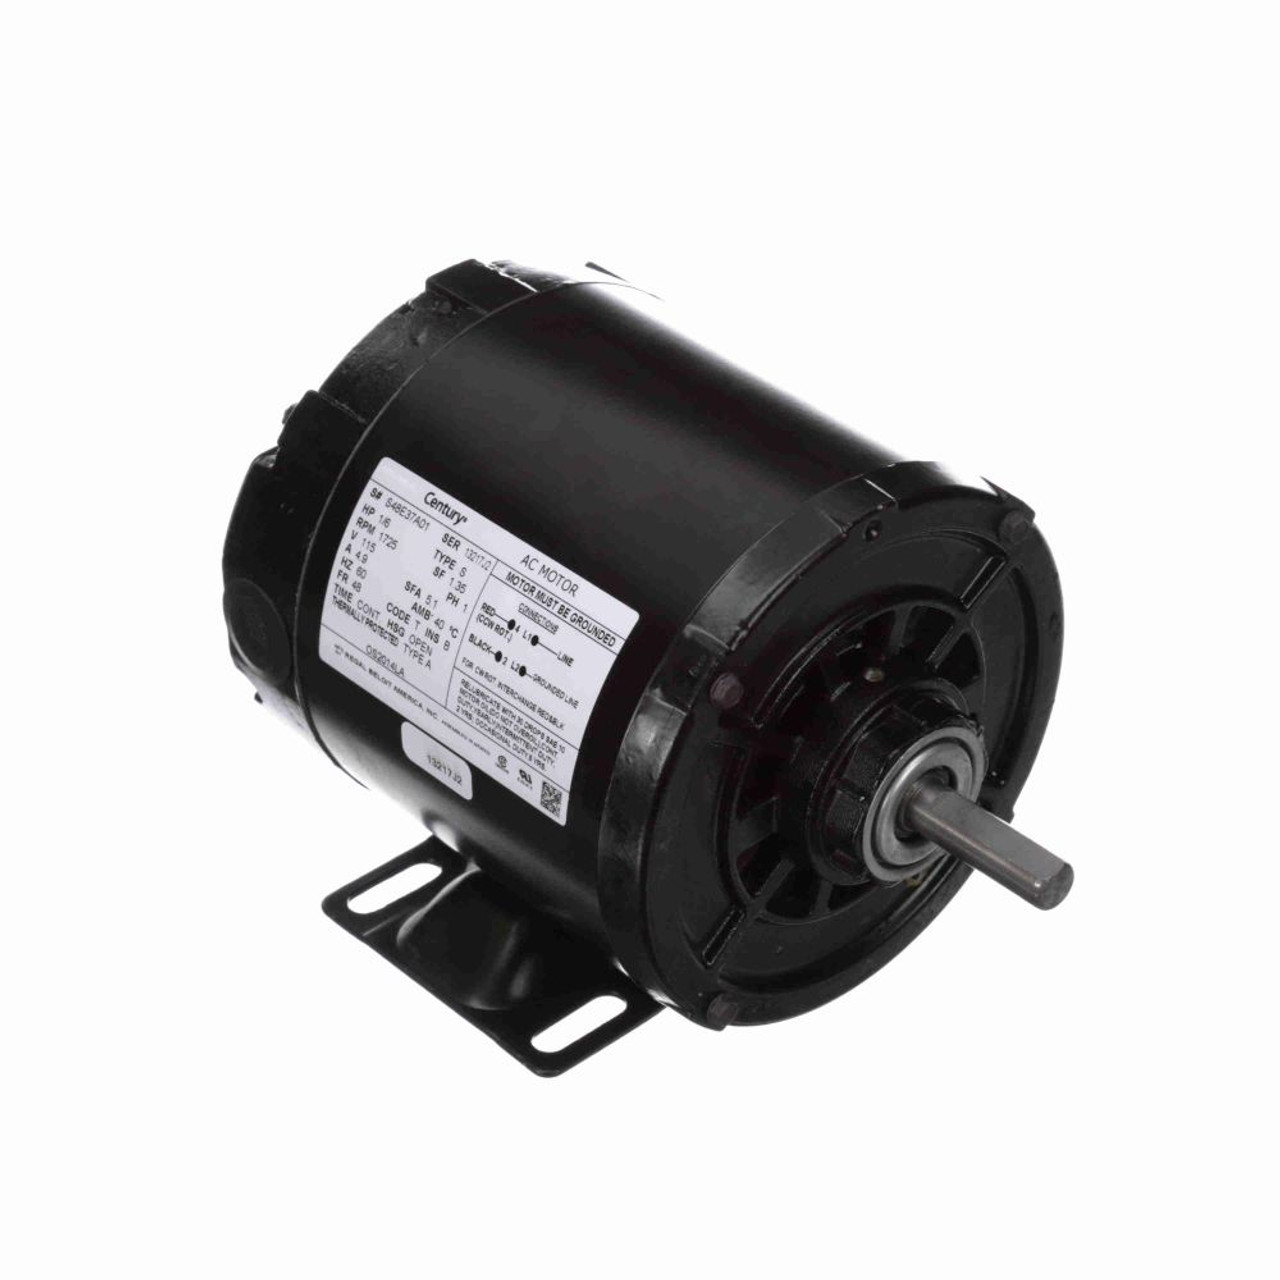 1  6 Hp 1725 Rpm 48 Frame 115v Split Phase Rigid Base Motor